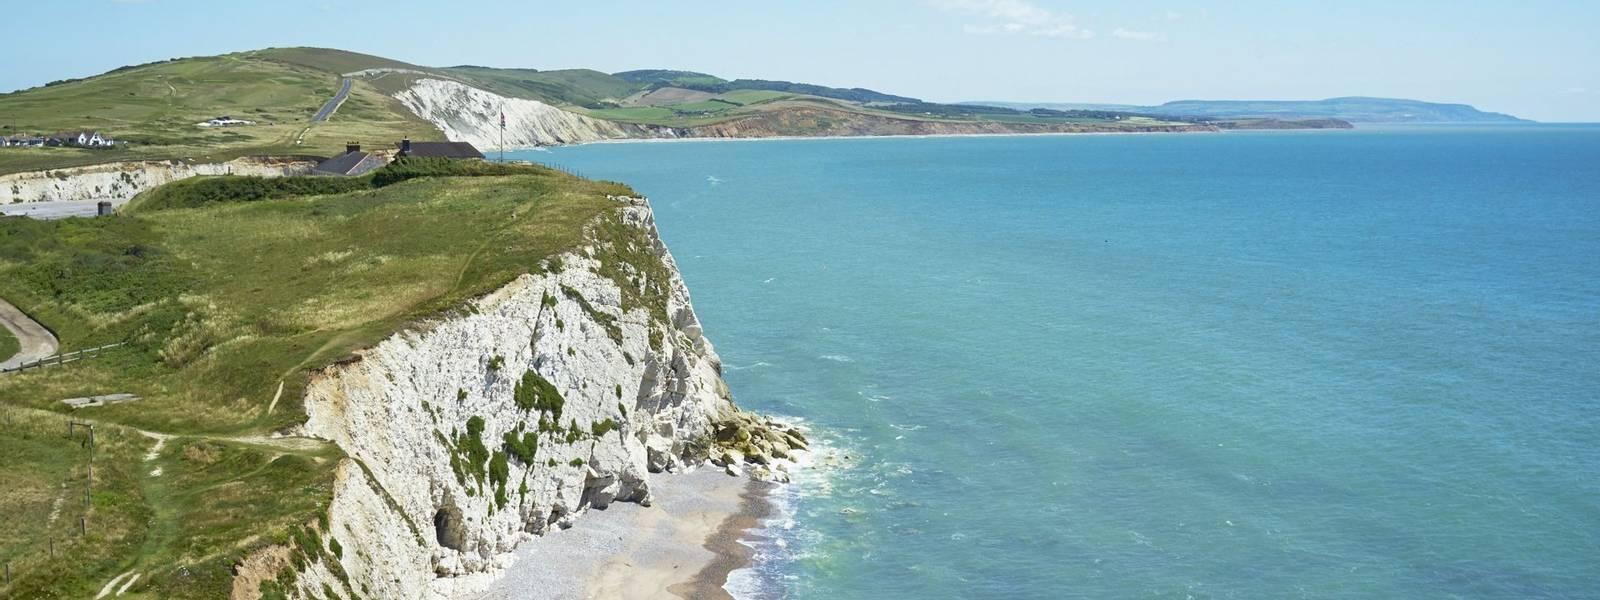 Isle_of_Wight_Freshwater_Bay_AdobeStock_166602085.jpg